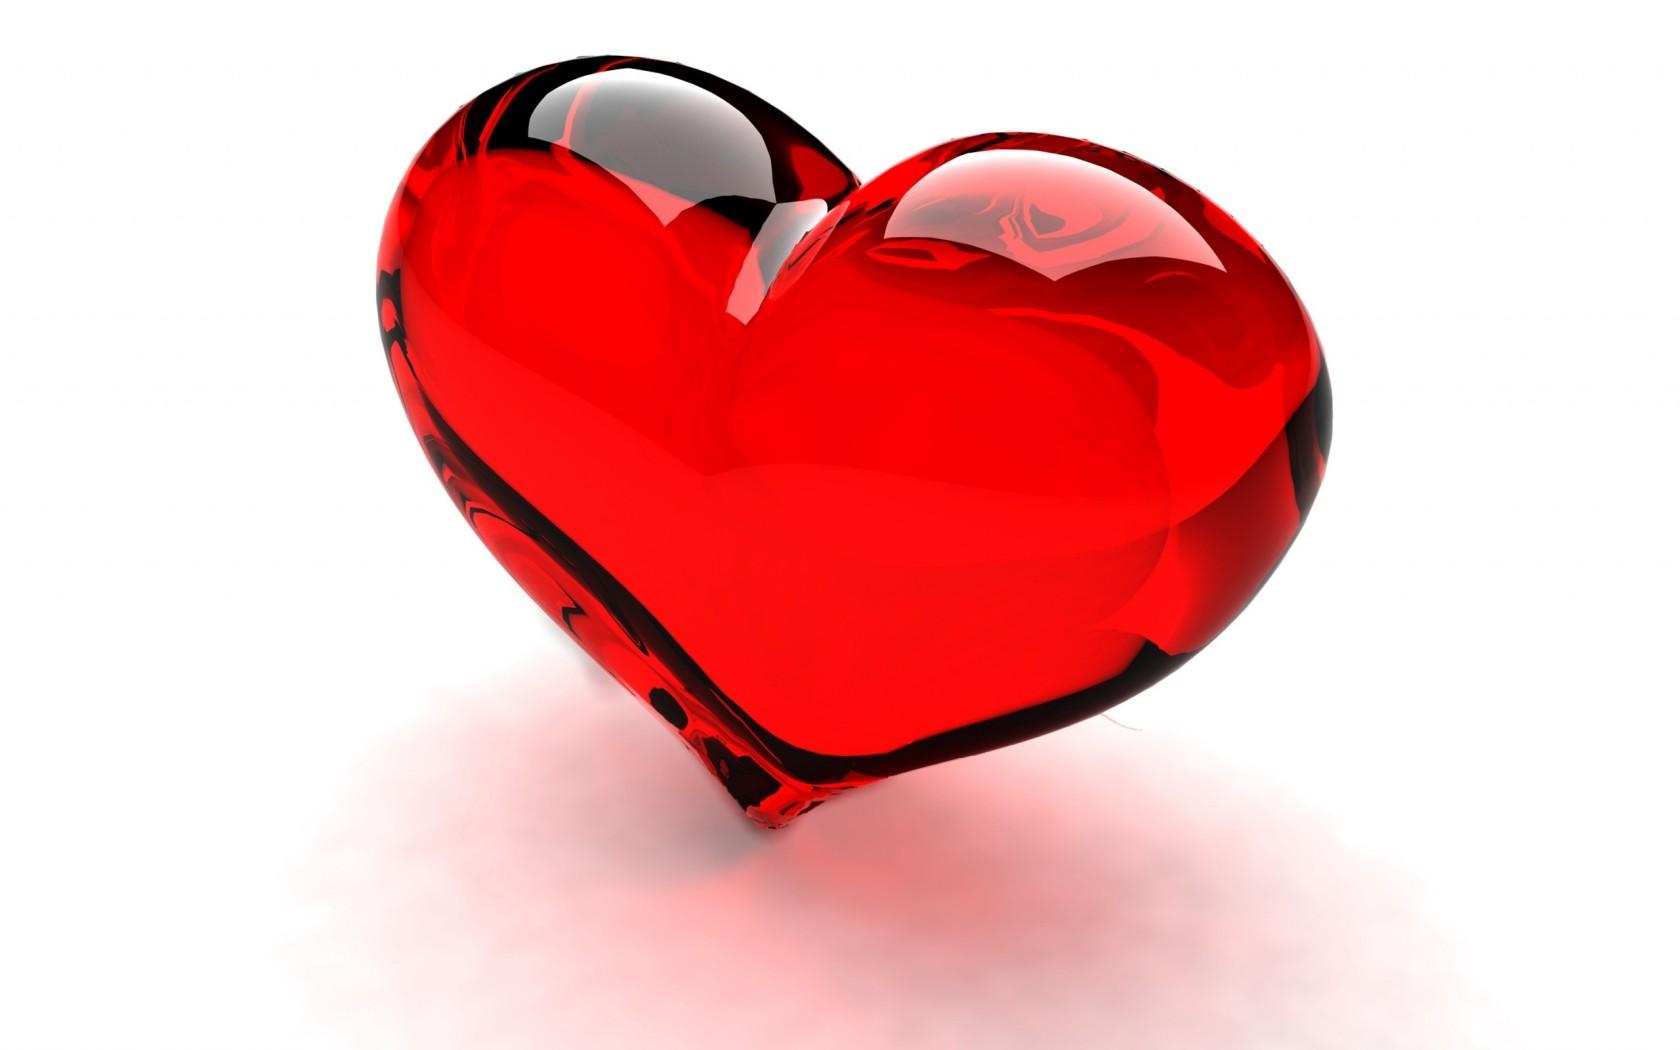 http://www.zastavki.com/pictures/1680x1050/2011/Love_Glossy_heart_028182_.jpg